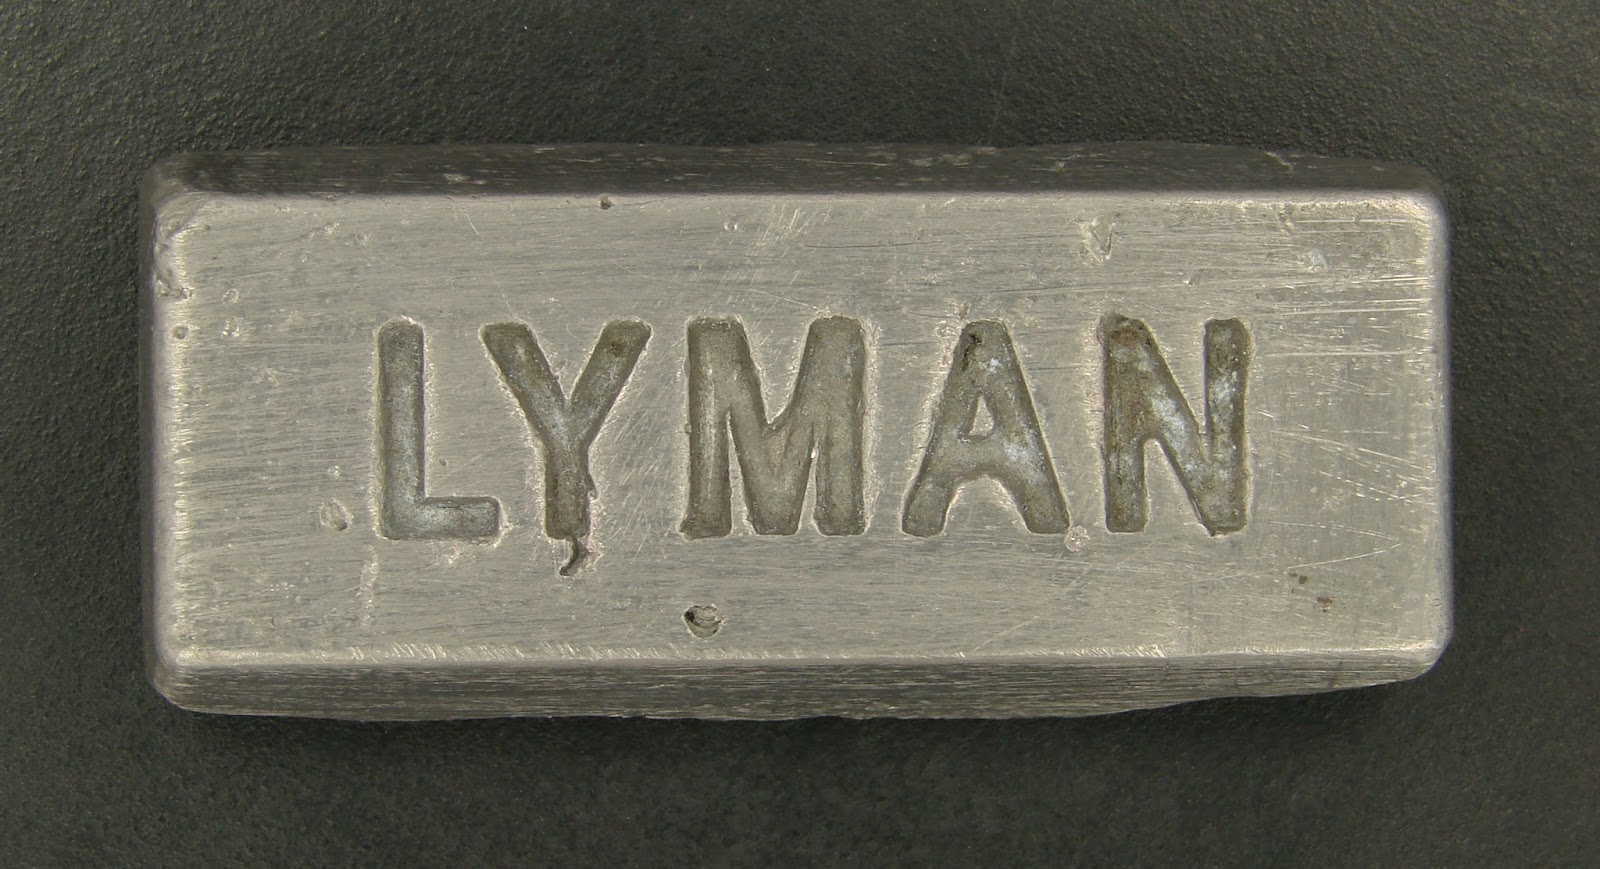 Lyman Silver Bar Creepingthyme Info